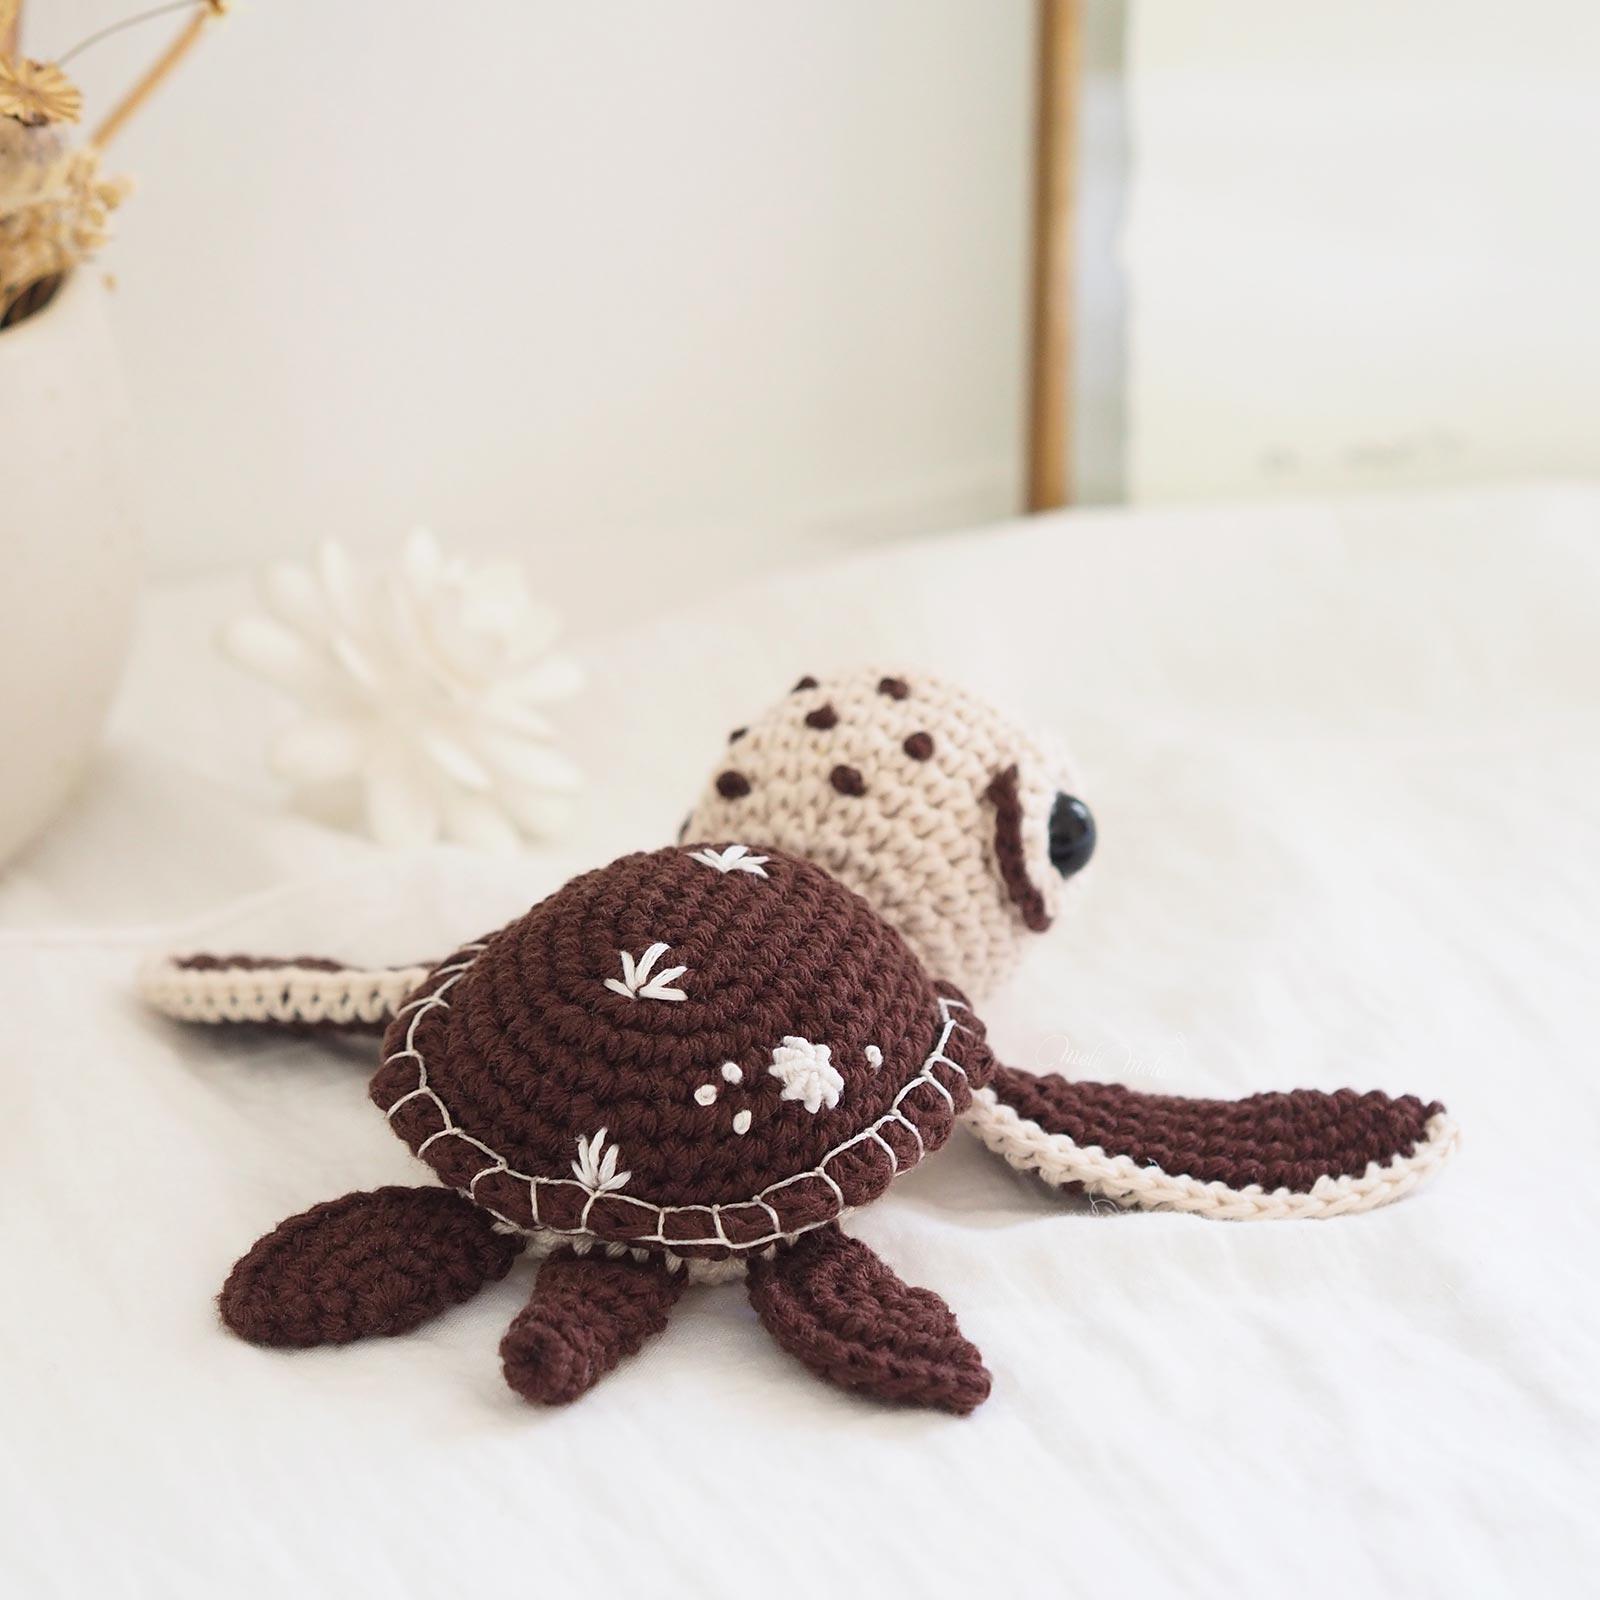 amigurumi-green-sea-turtle-amigurumiwildlife-crochet-tortue-mer-laboutiquedemelimelo